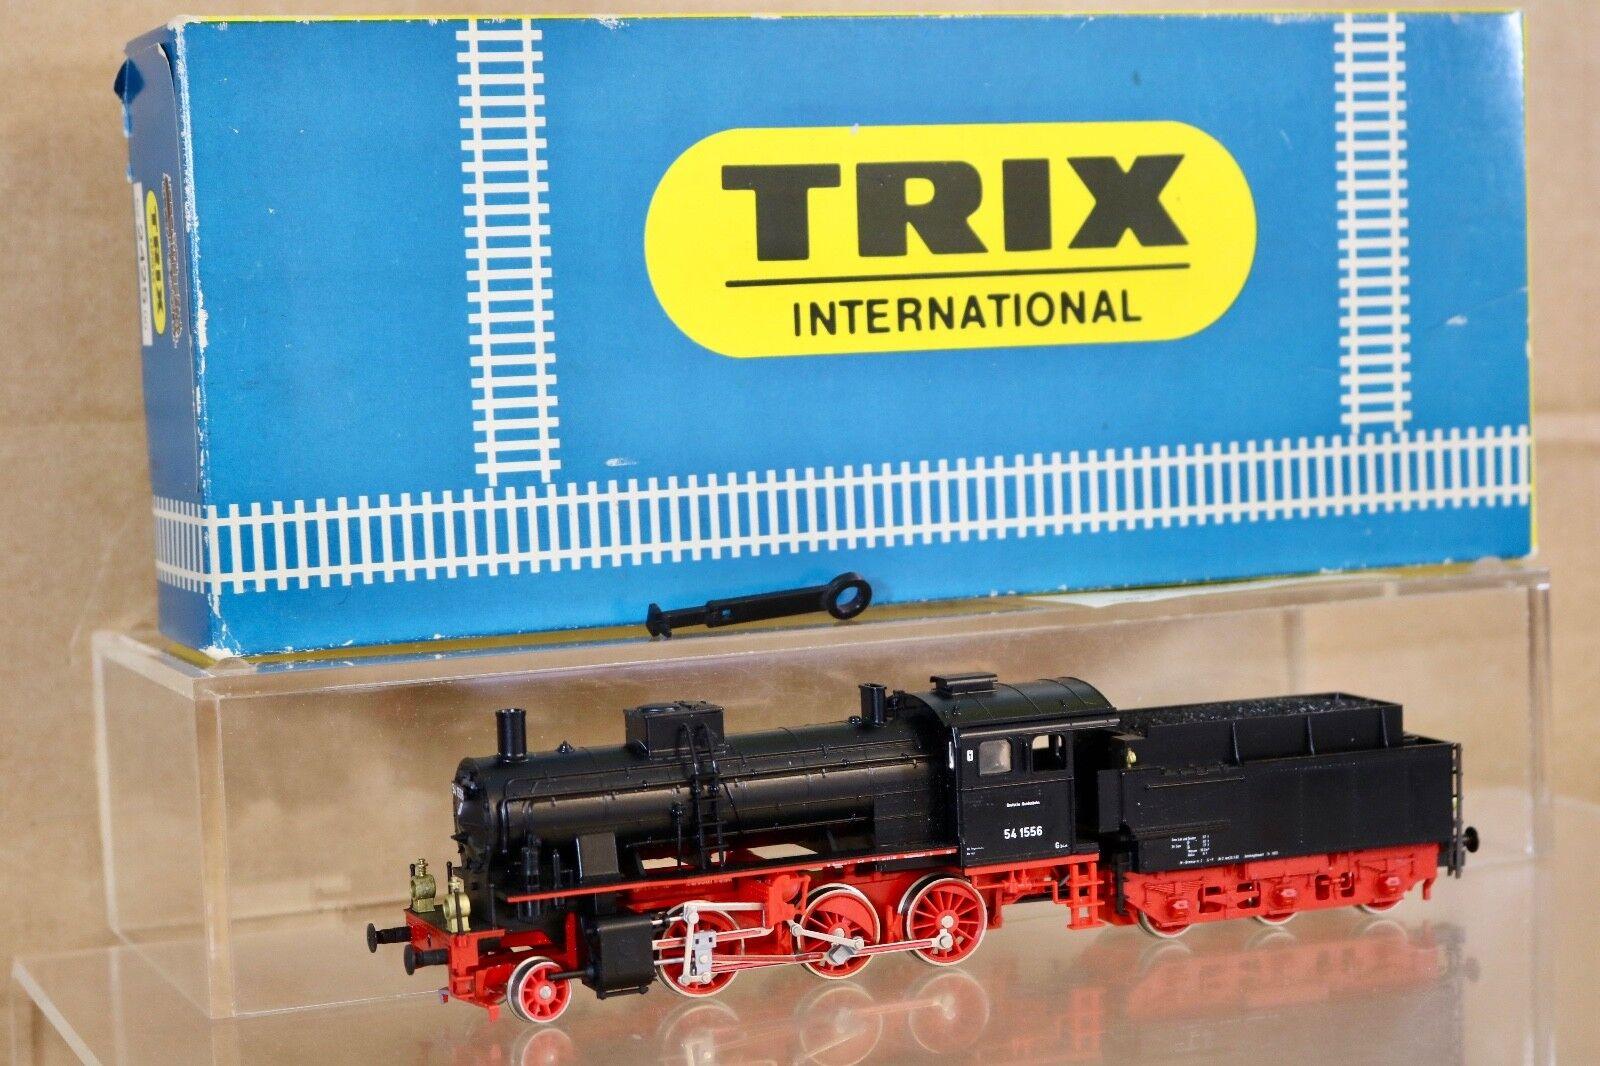 TRIX 2425 DB 2-6-0 CLASS BR 54 1556 DAMPFLOK LOCOMOTIVE BOXED np